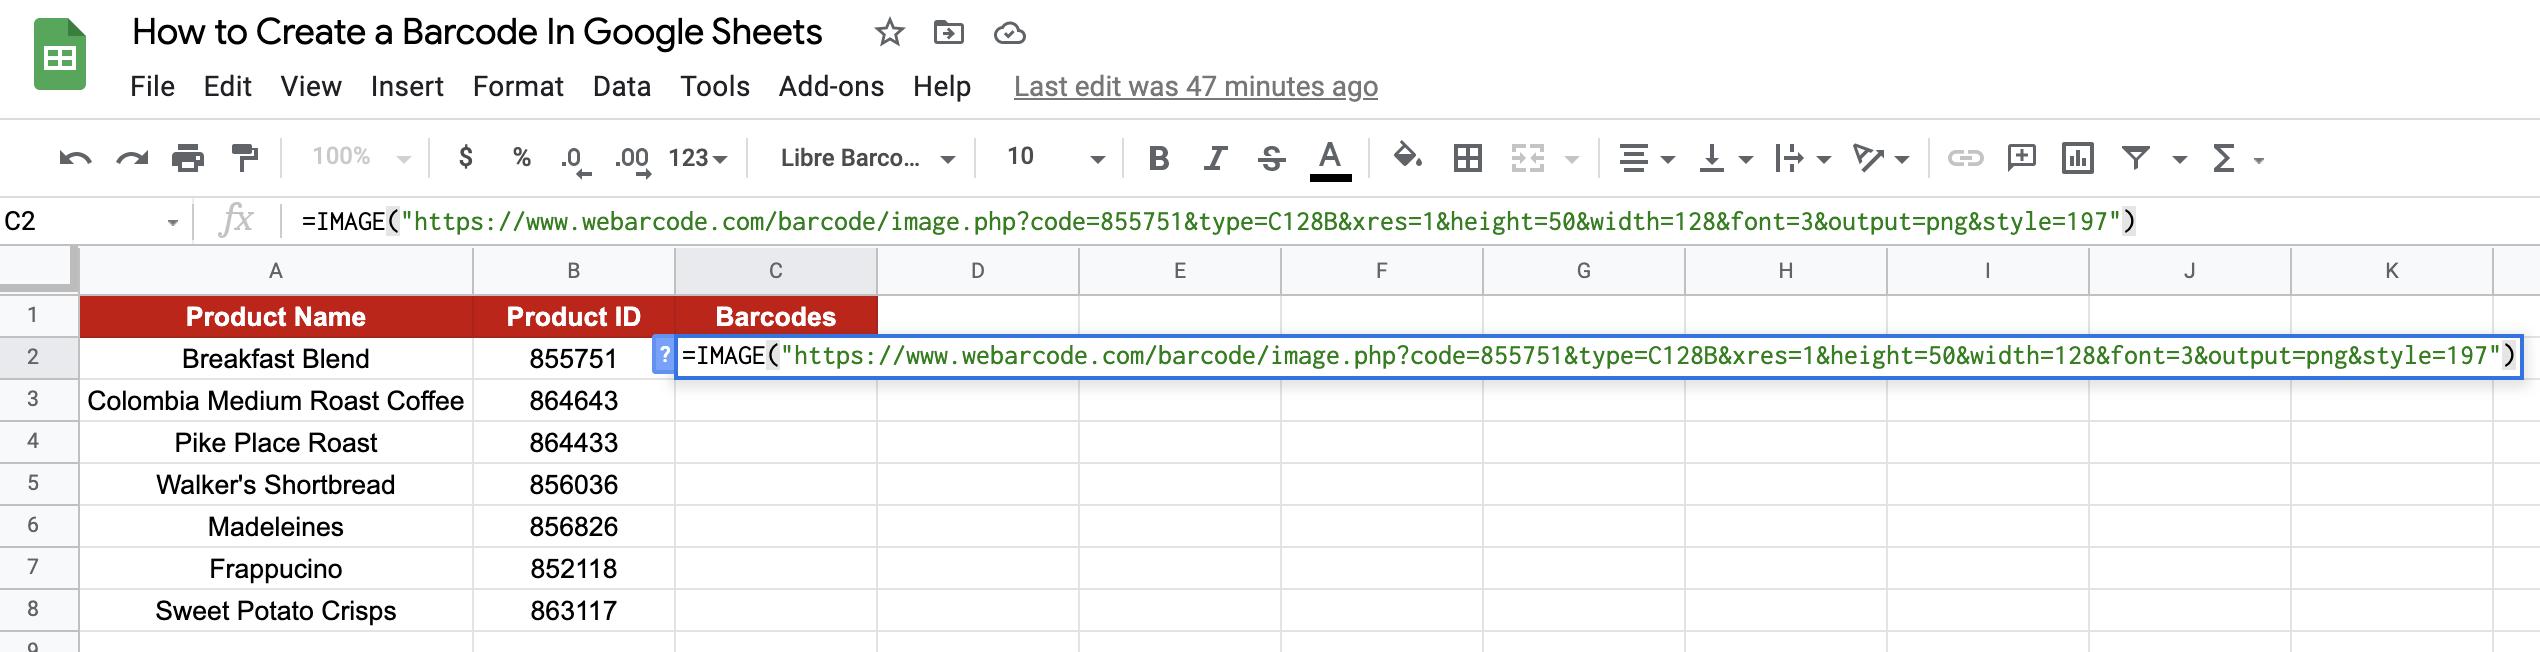 create barcode in google sheets